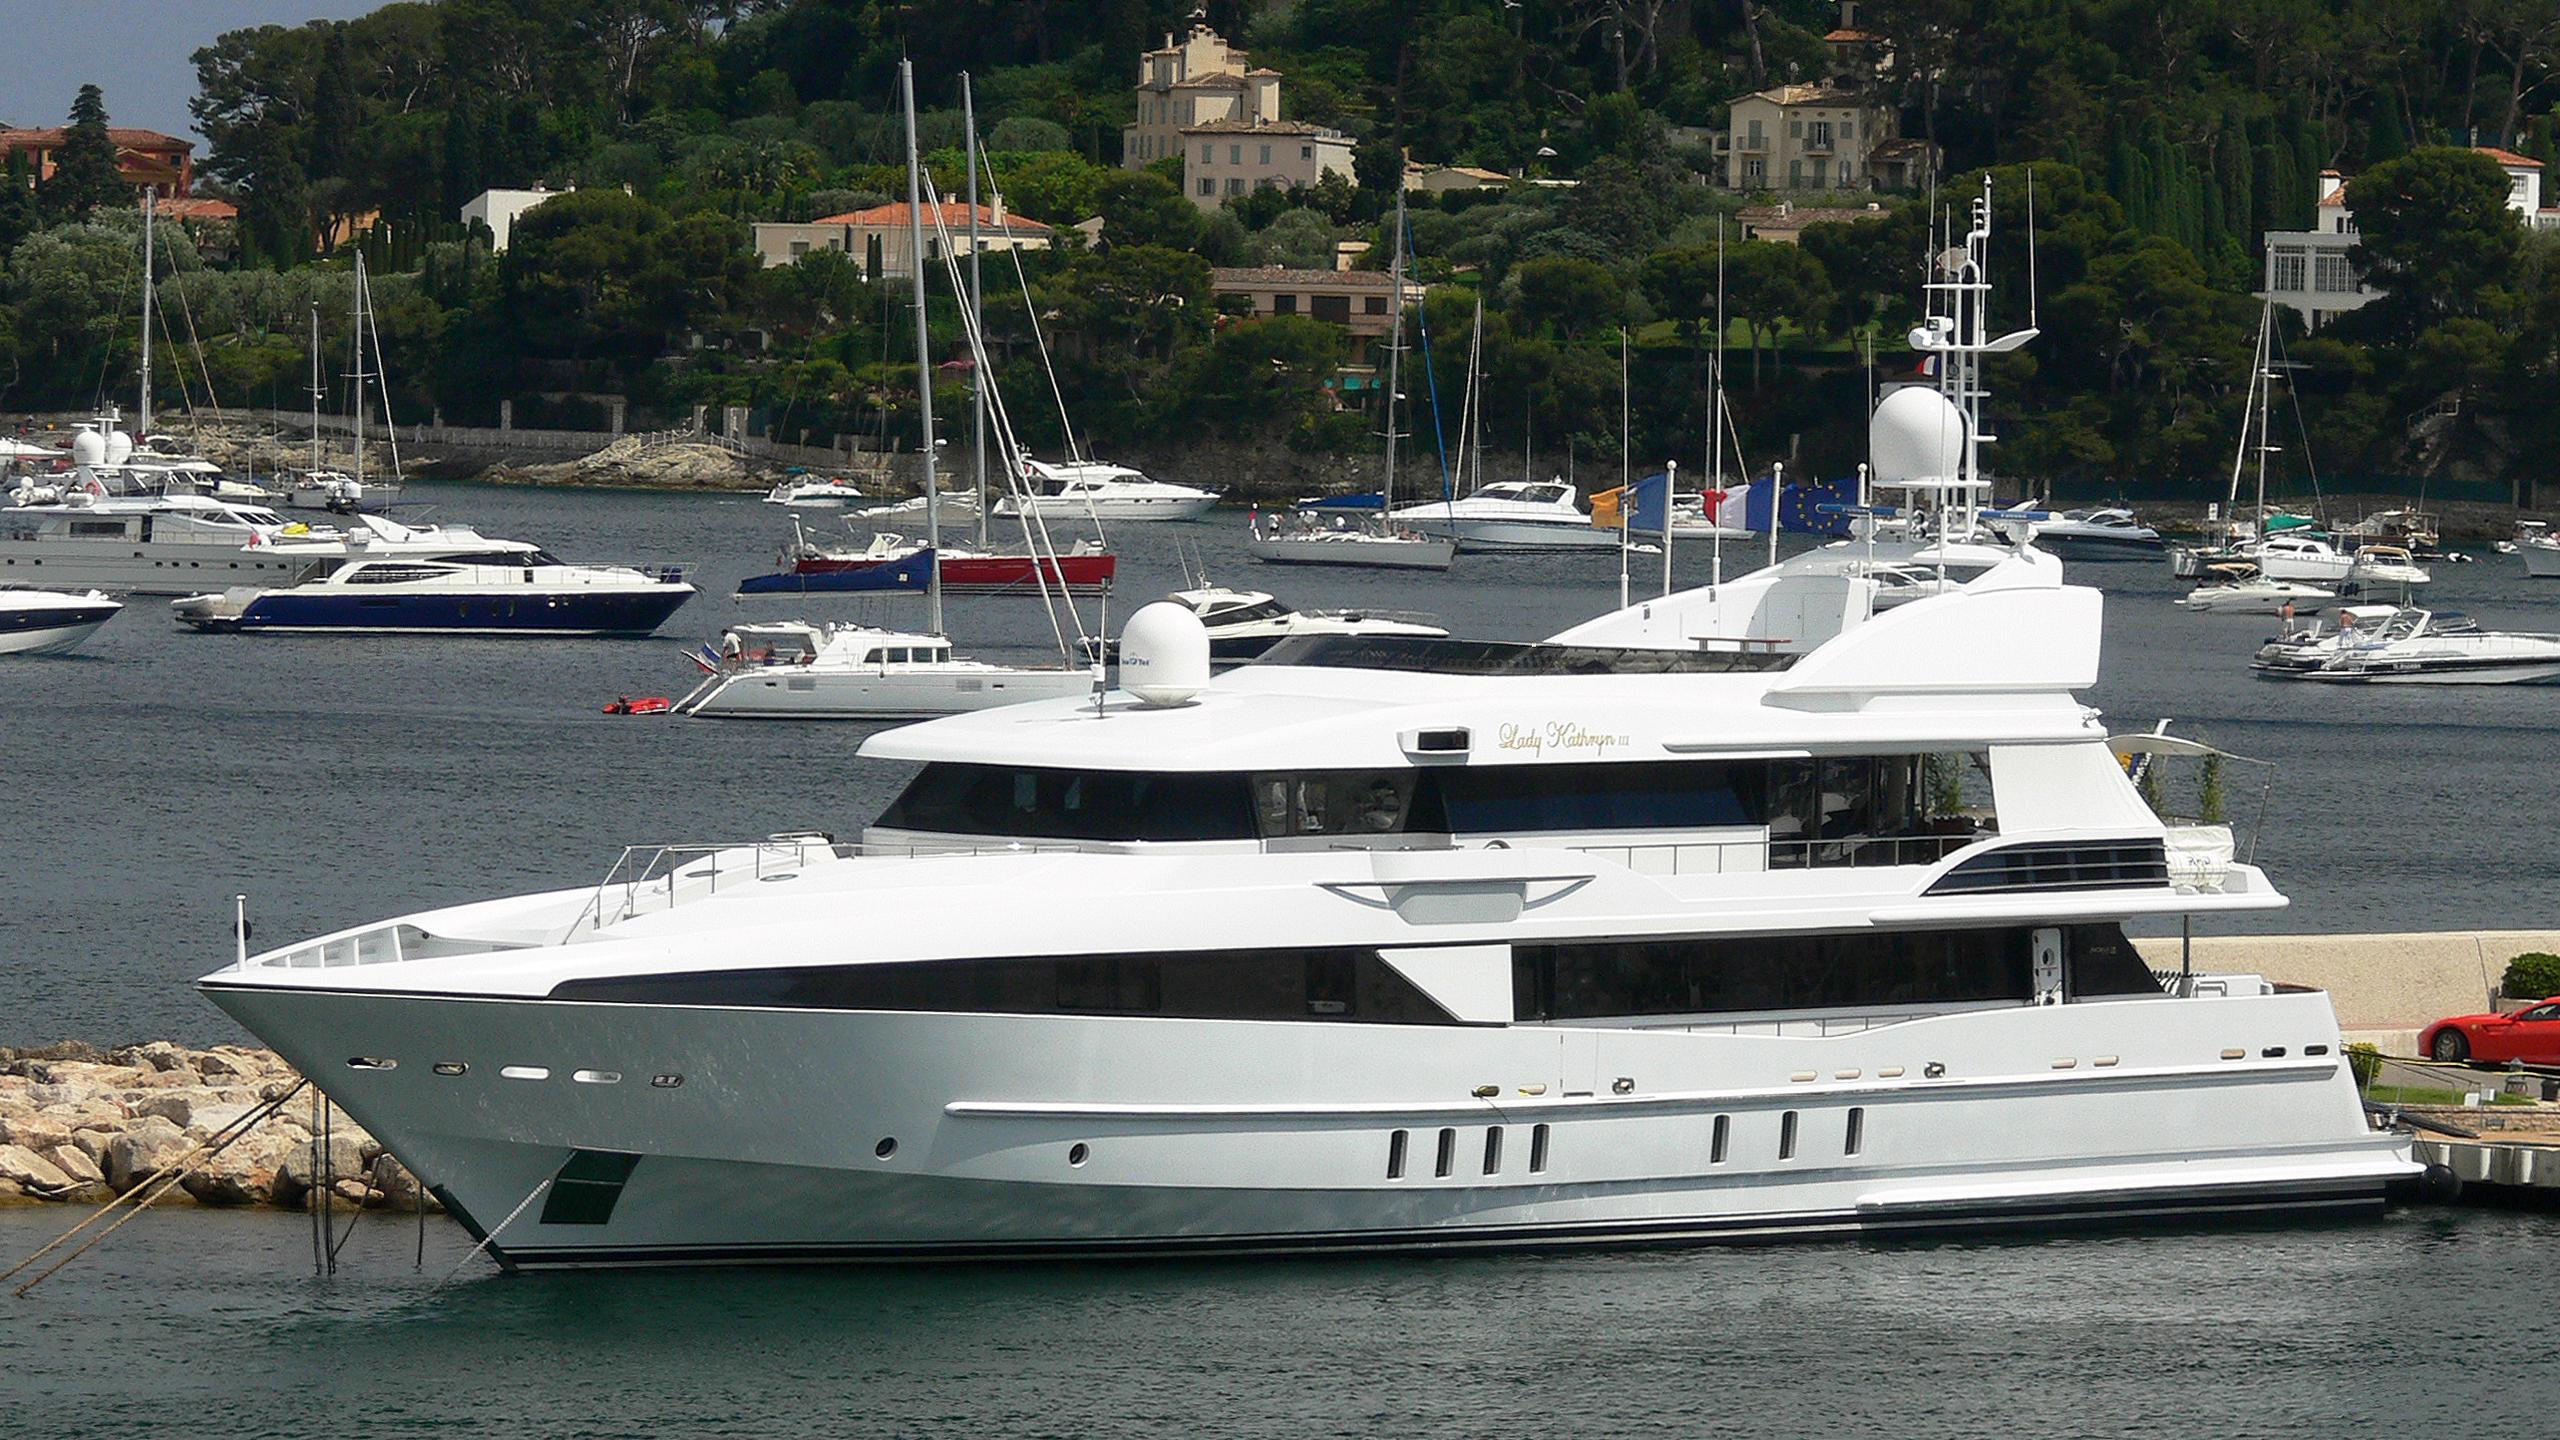 horizons-ii-motor-yacht-nqea-2004-44m-half-profile-moored